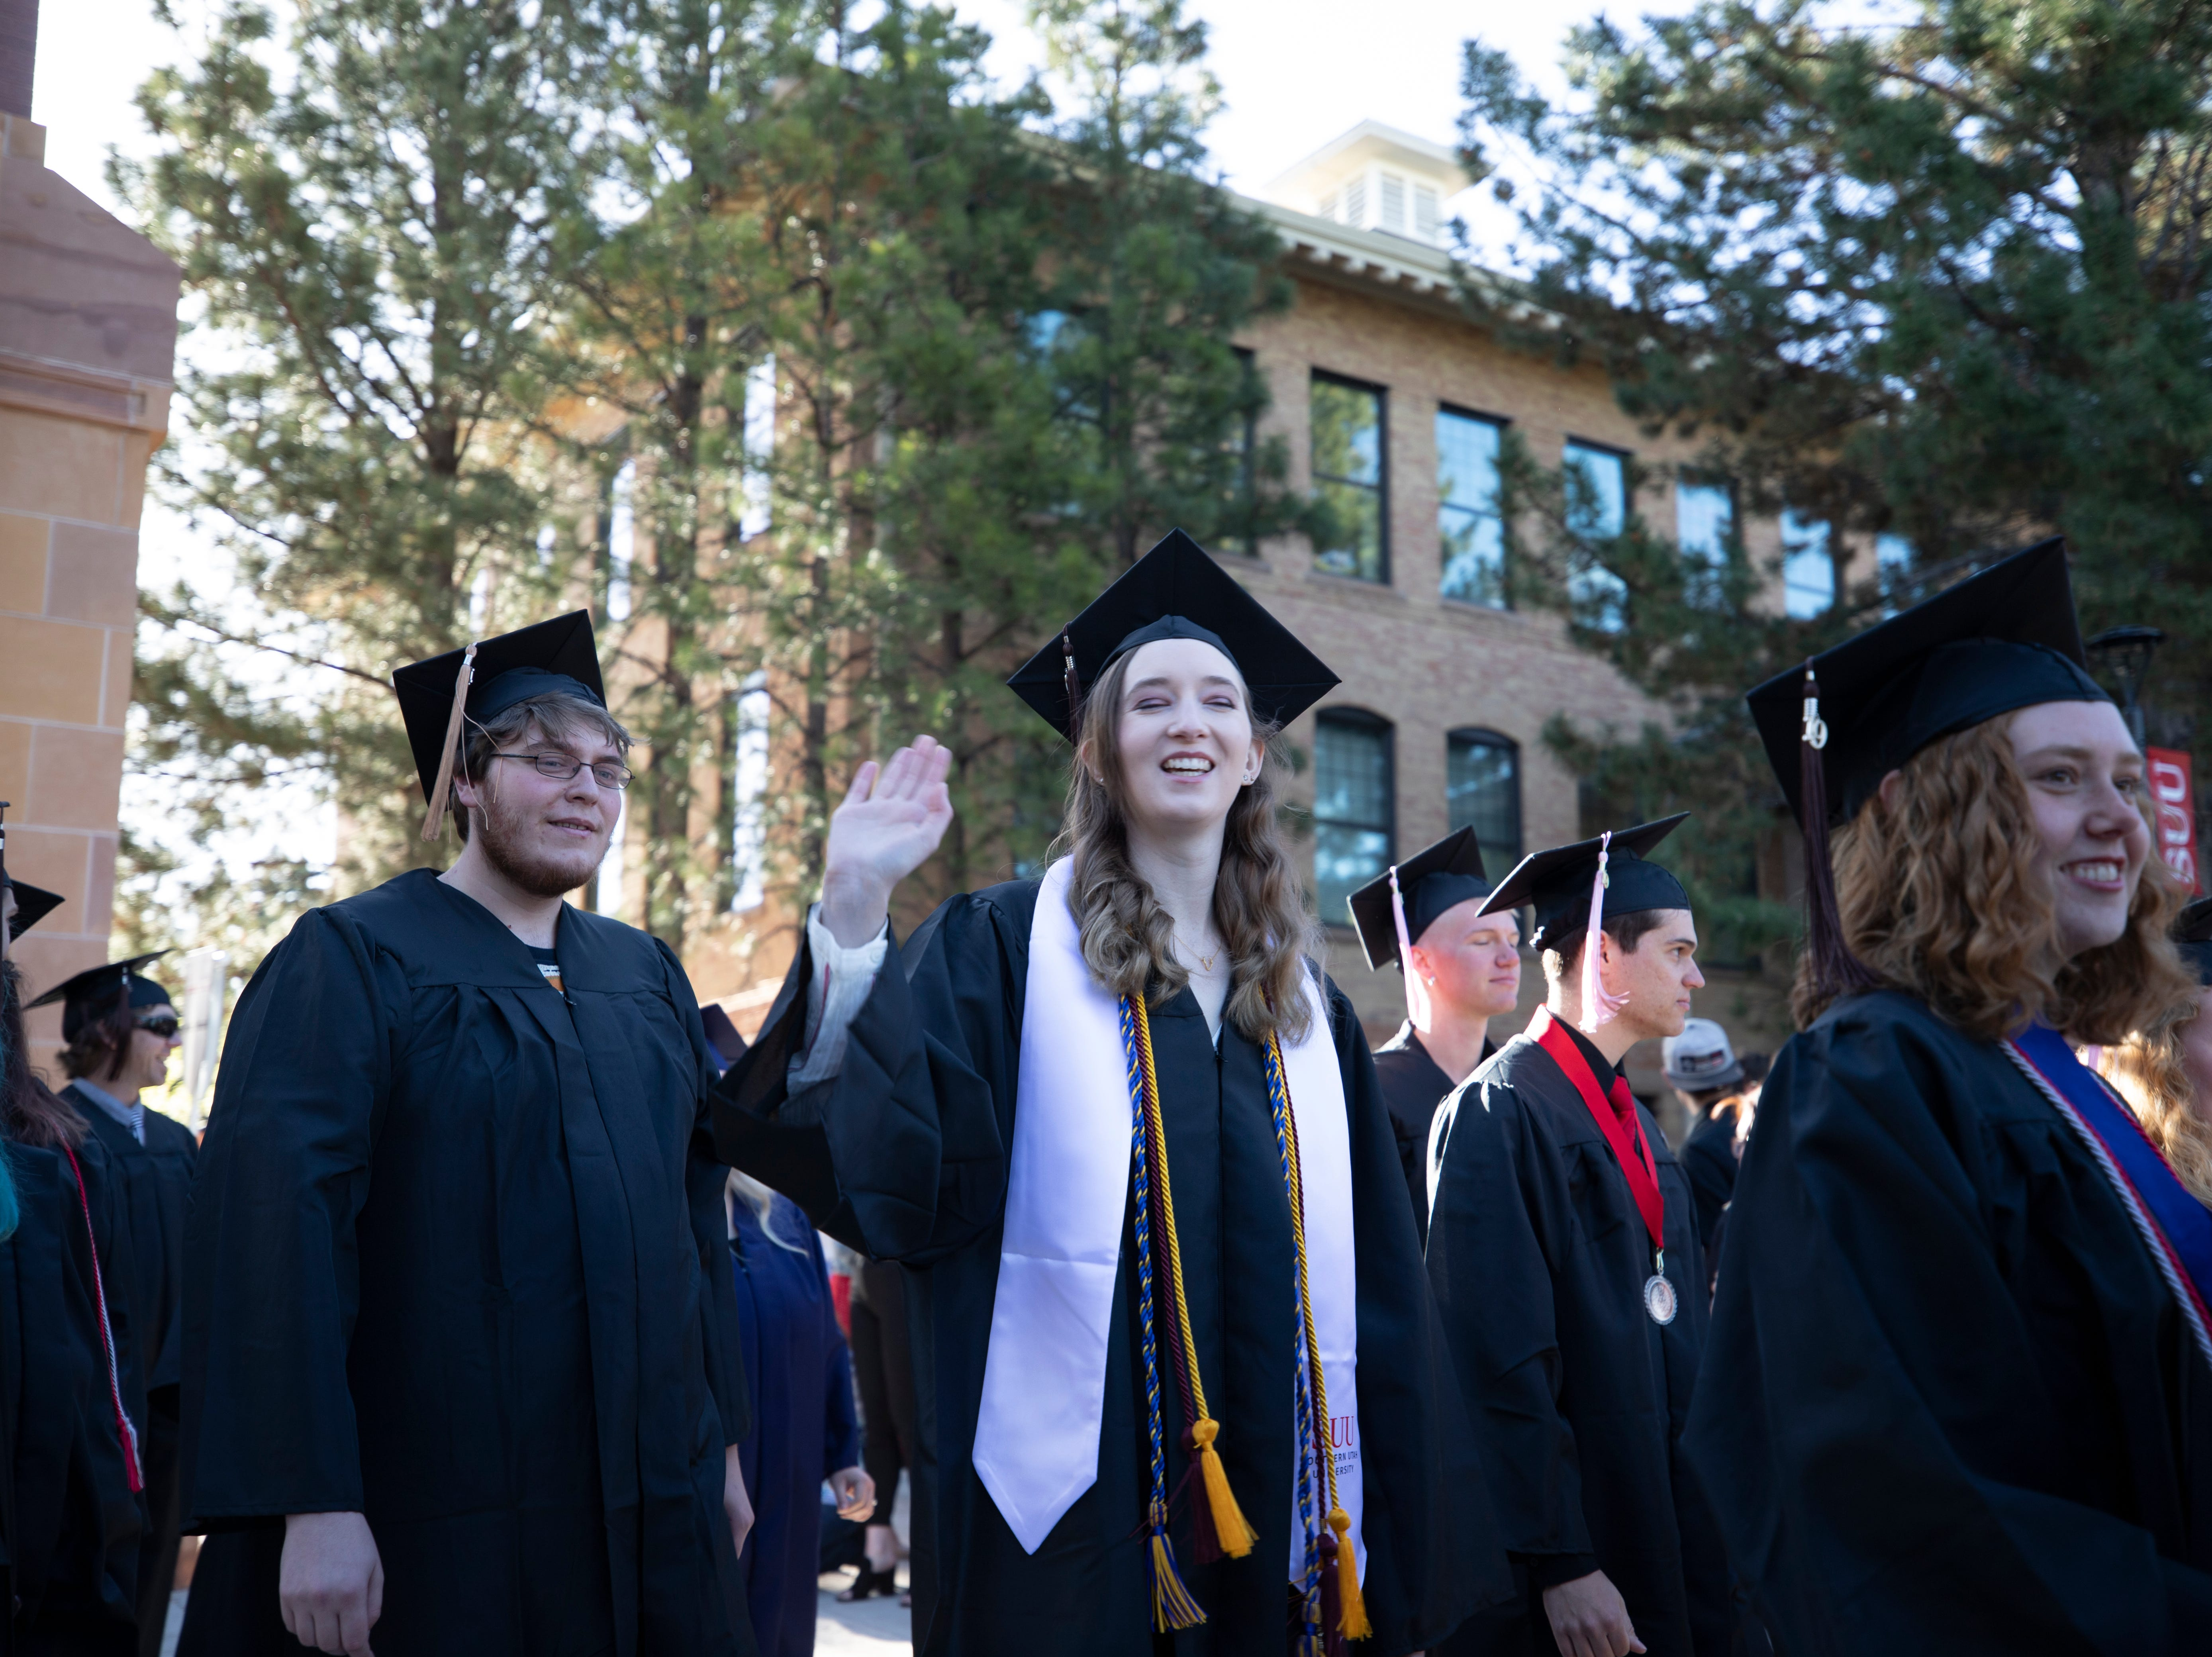 2019 commencement ceremonies at Southern Utah University.